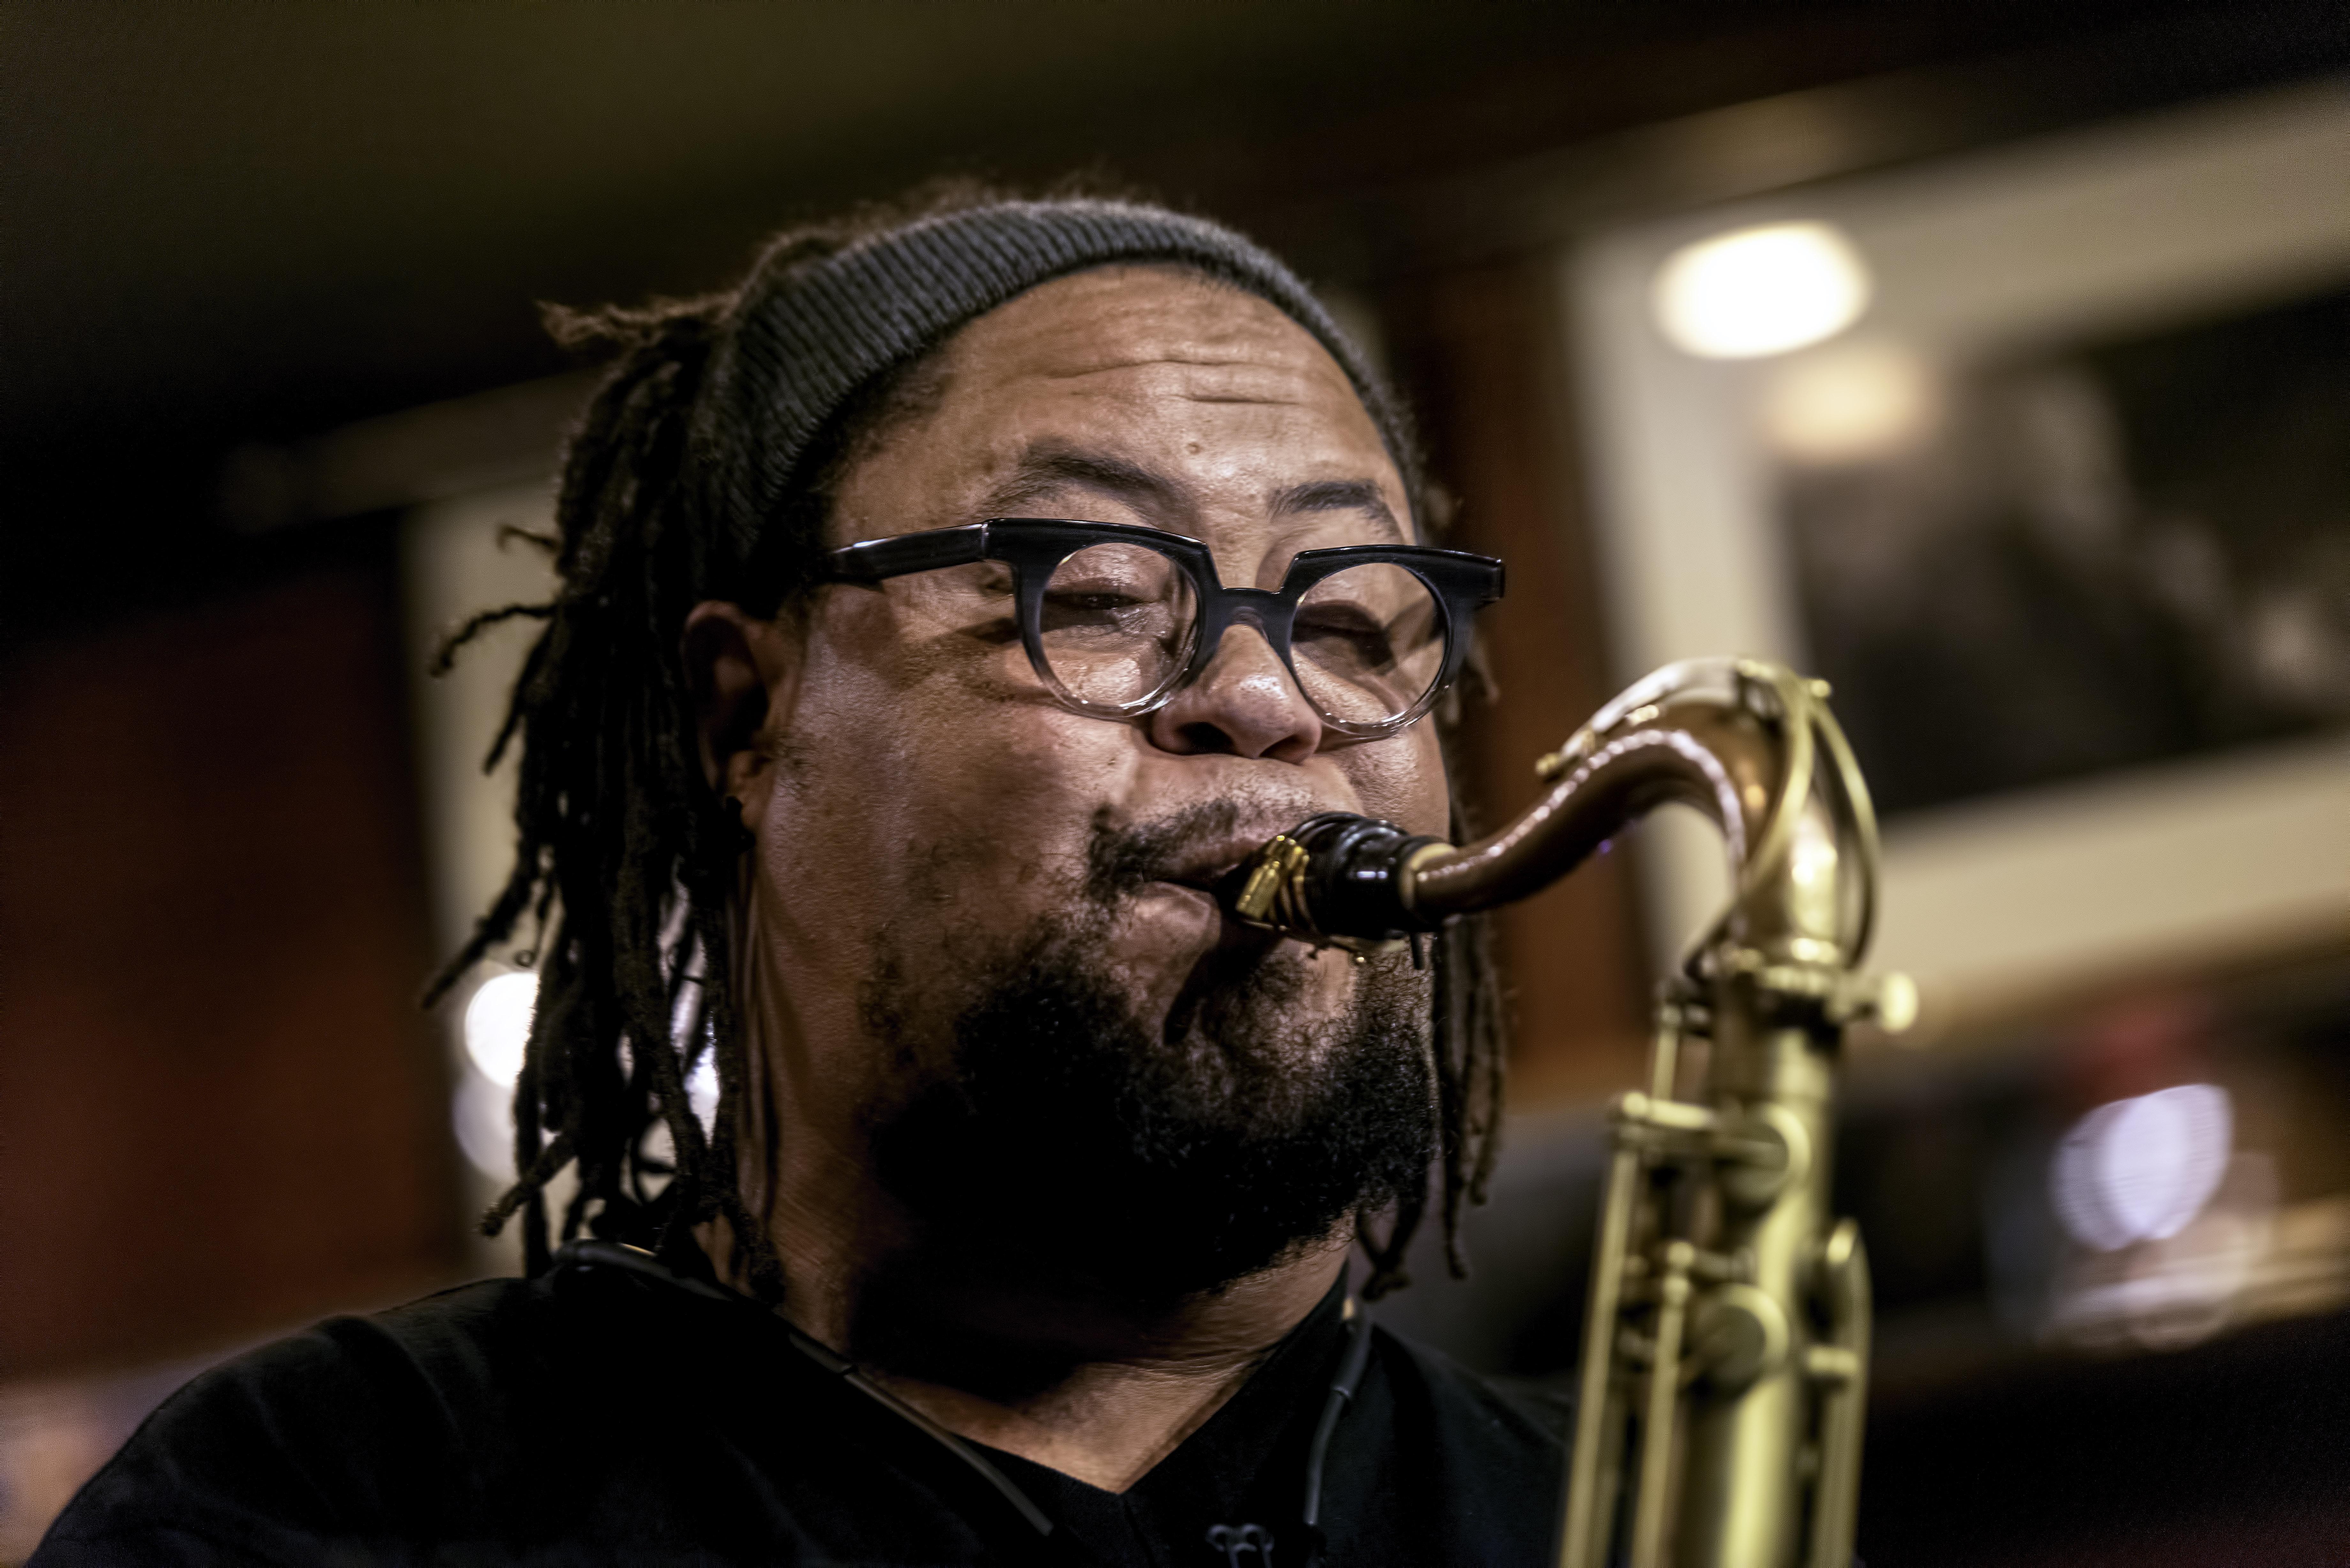 Dayna Stephens at the Rex Jazz Bar at the Toronto Jazz Festival 2019